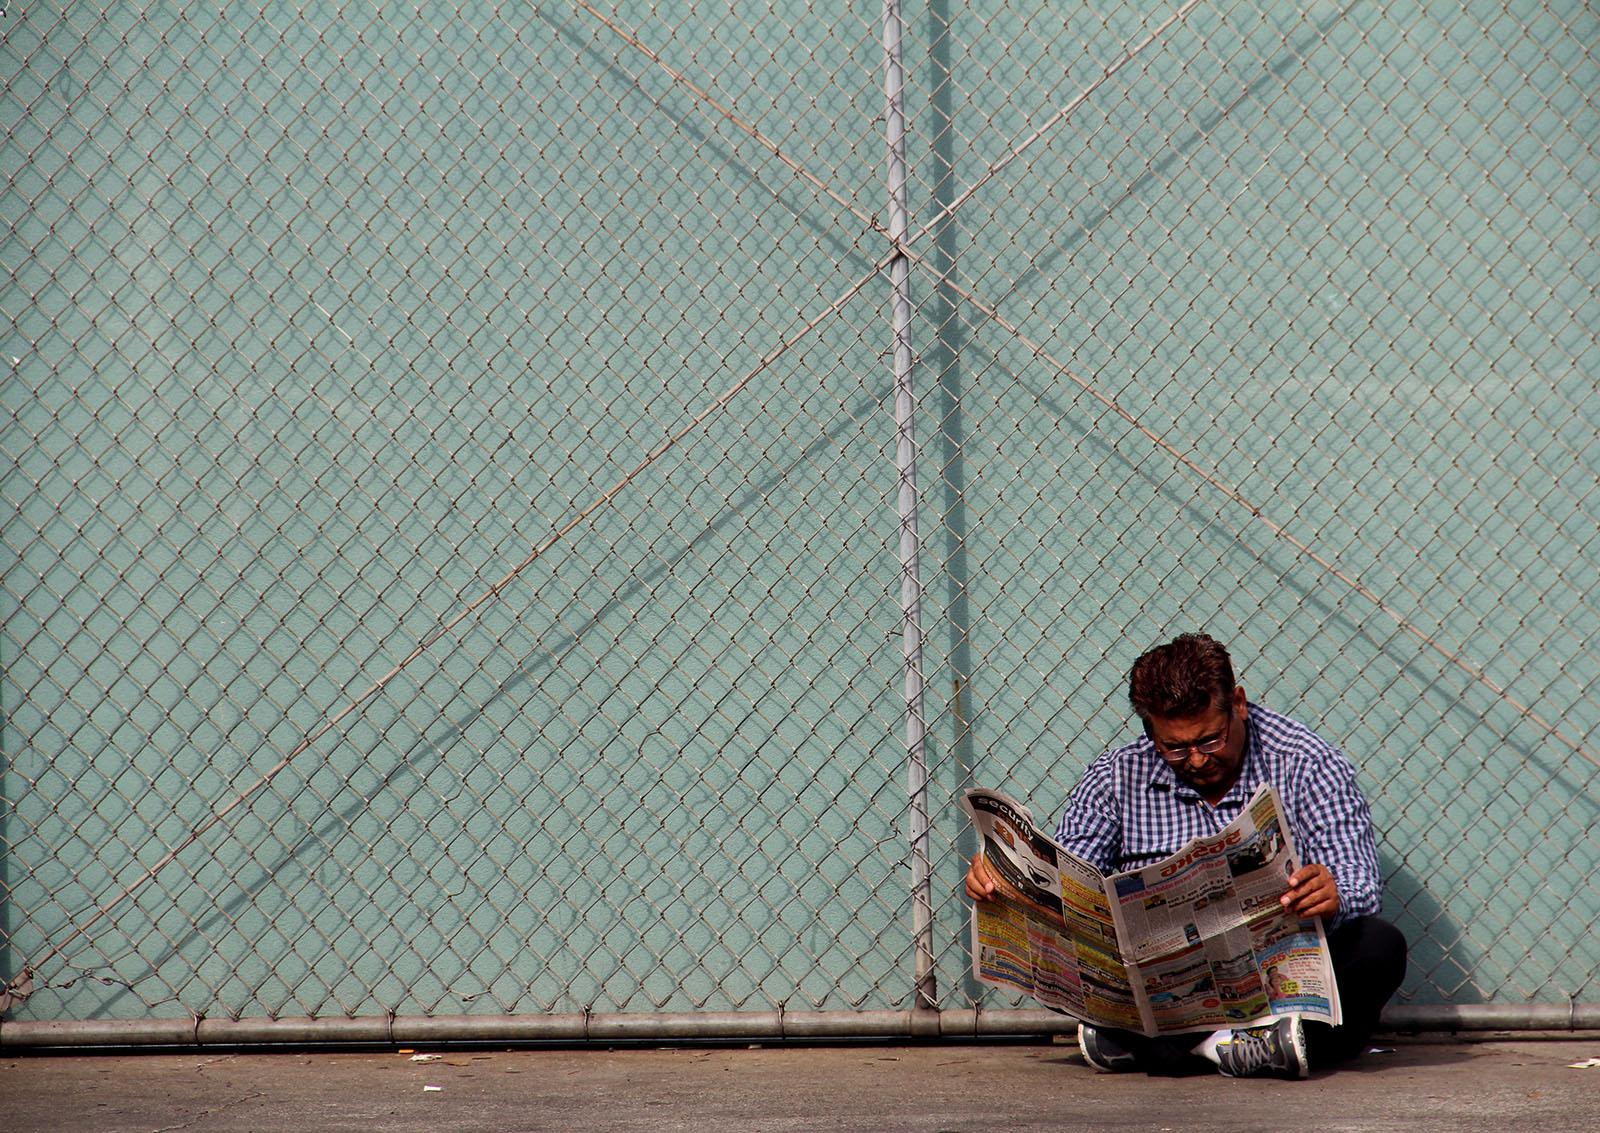 A man reads a newspaper on Folsom Street.